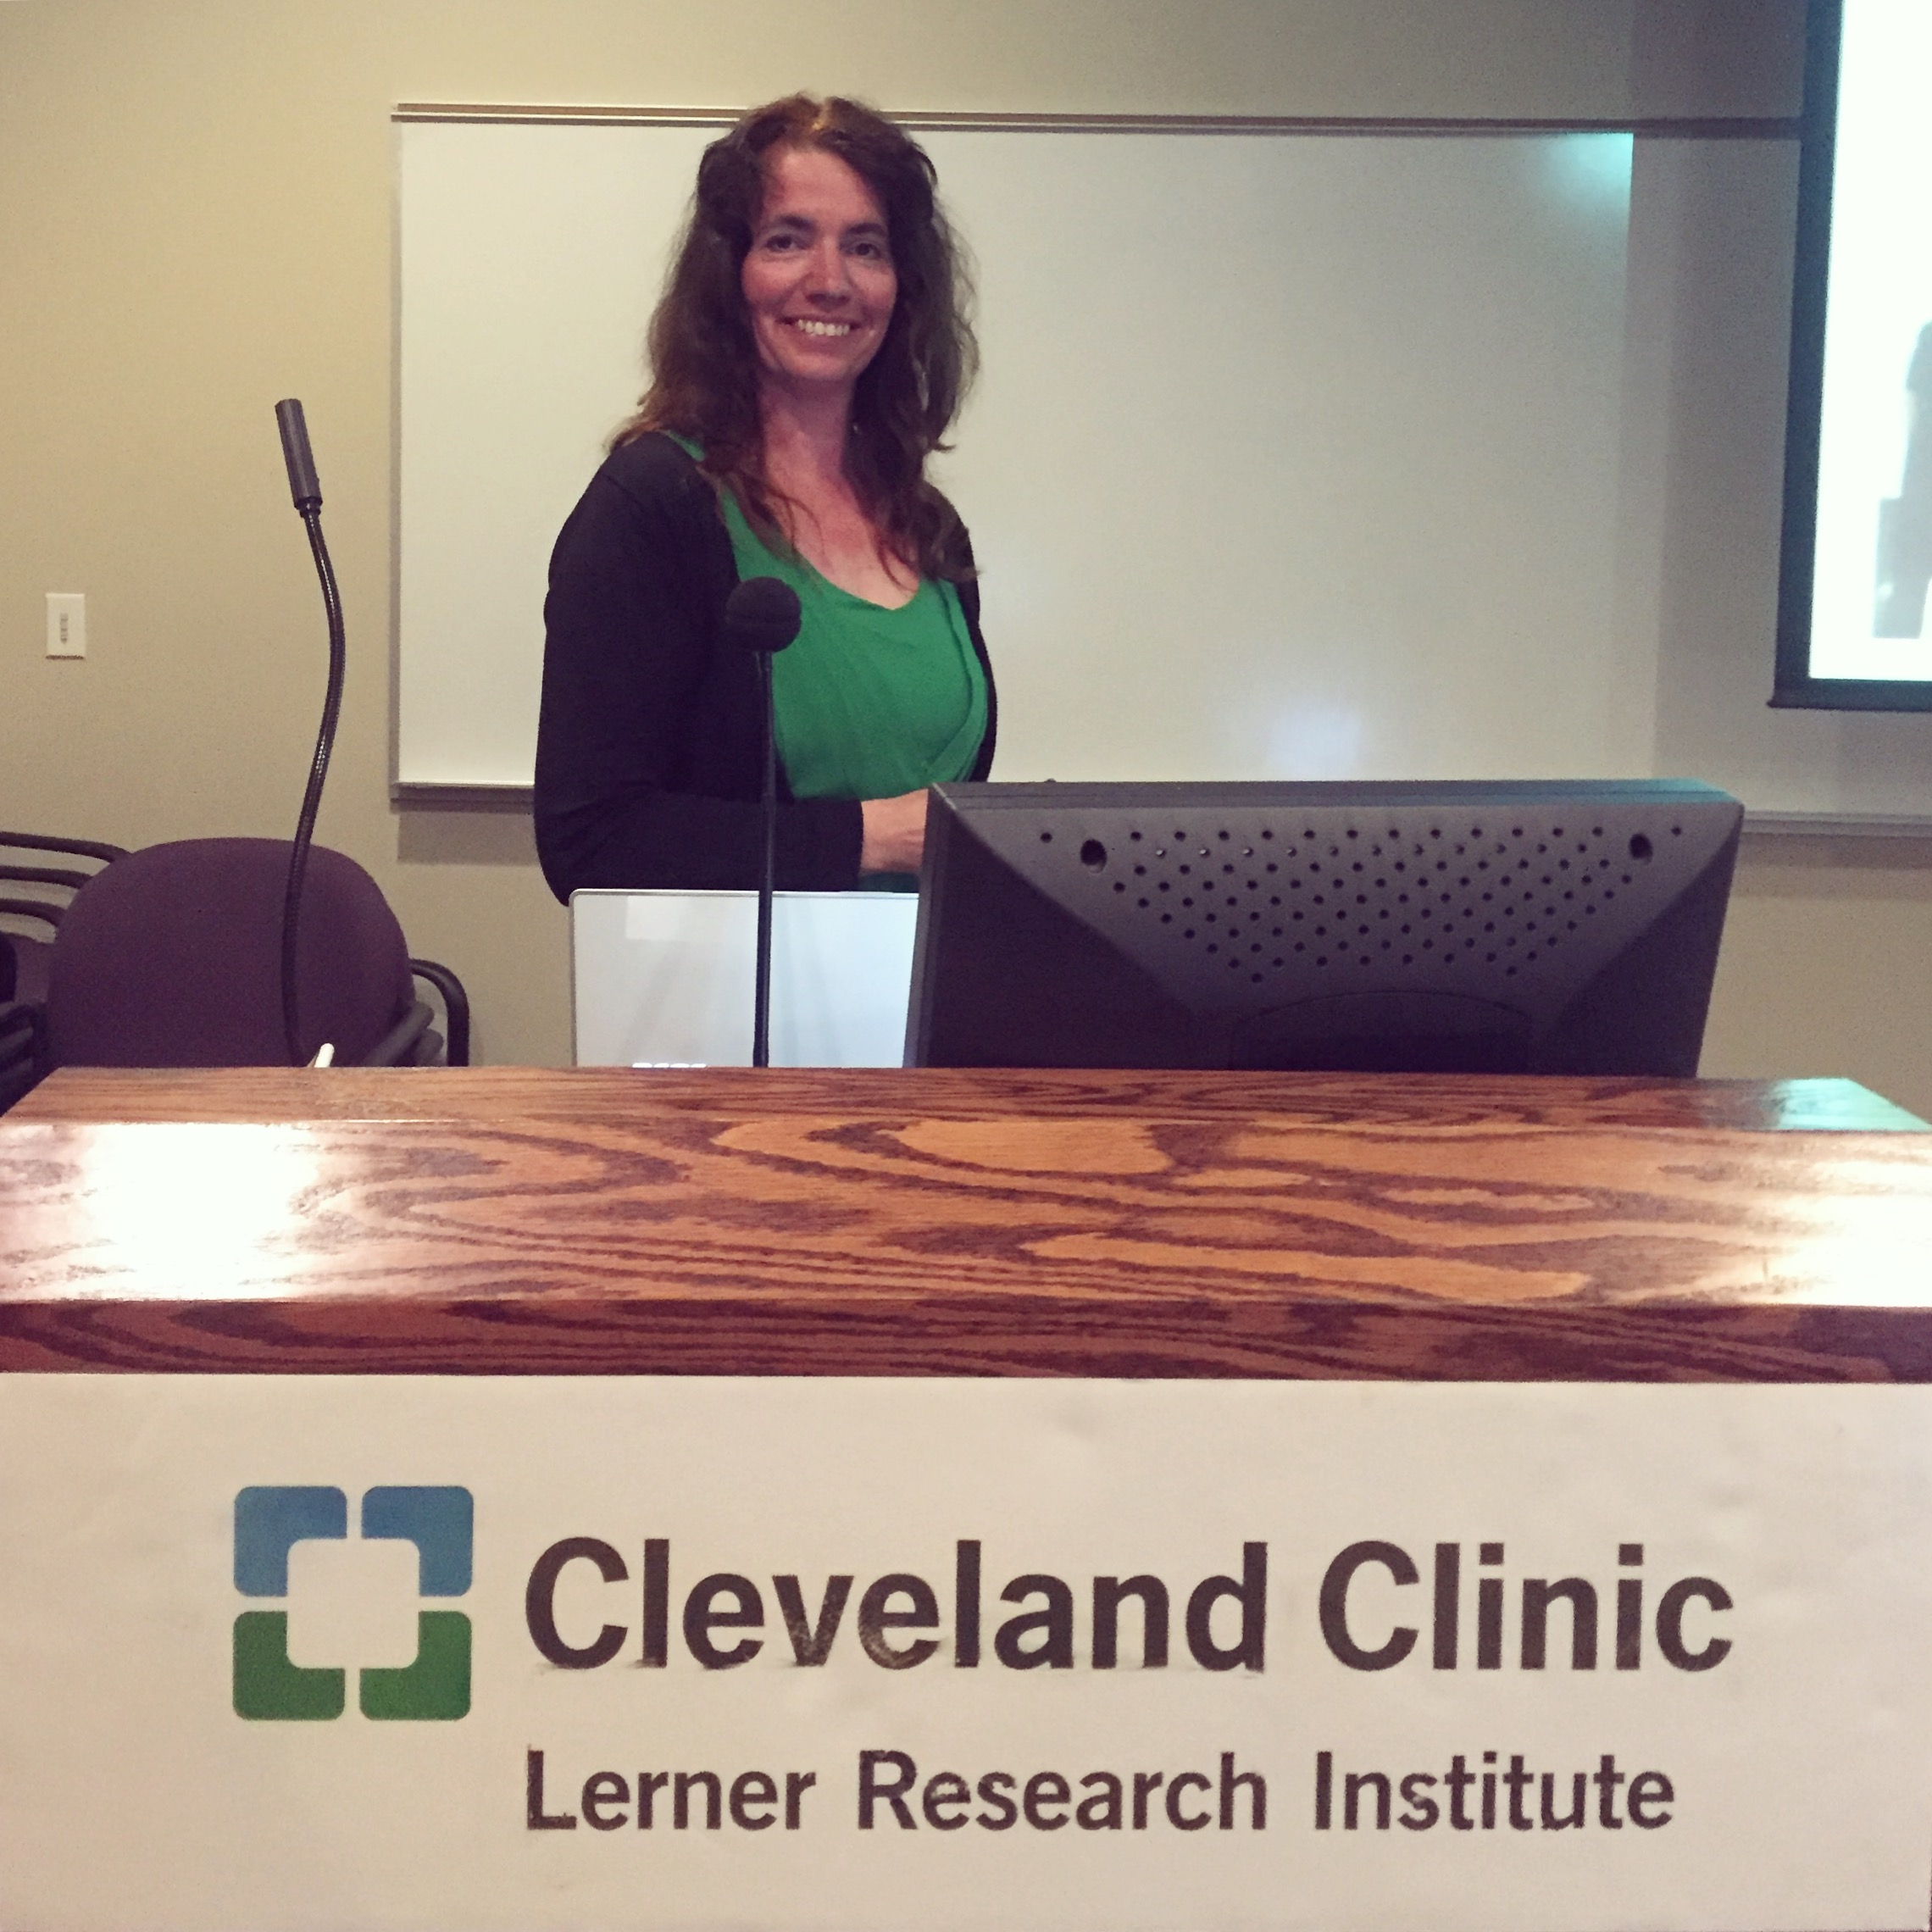 Bianca-Brundel-bij-Cleveland-Clinic